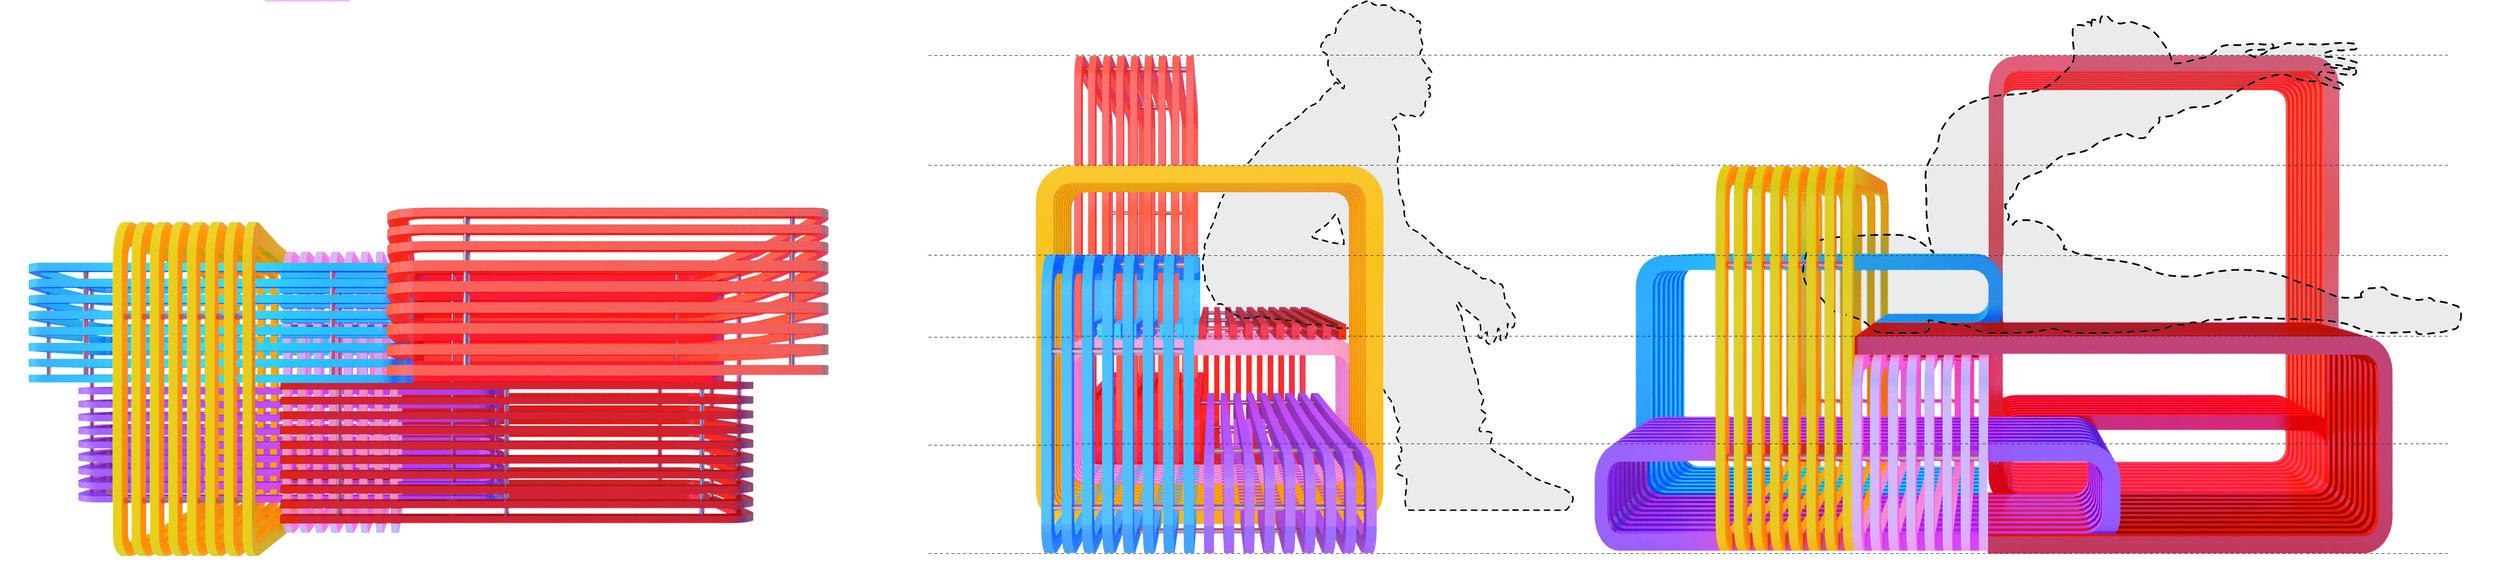 BENCH DRAWINGS-1.jpg